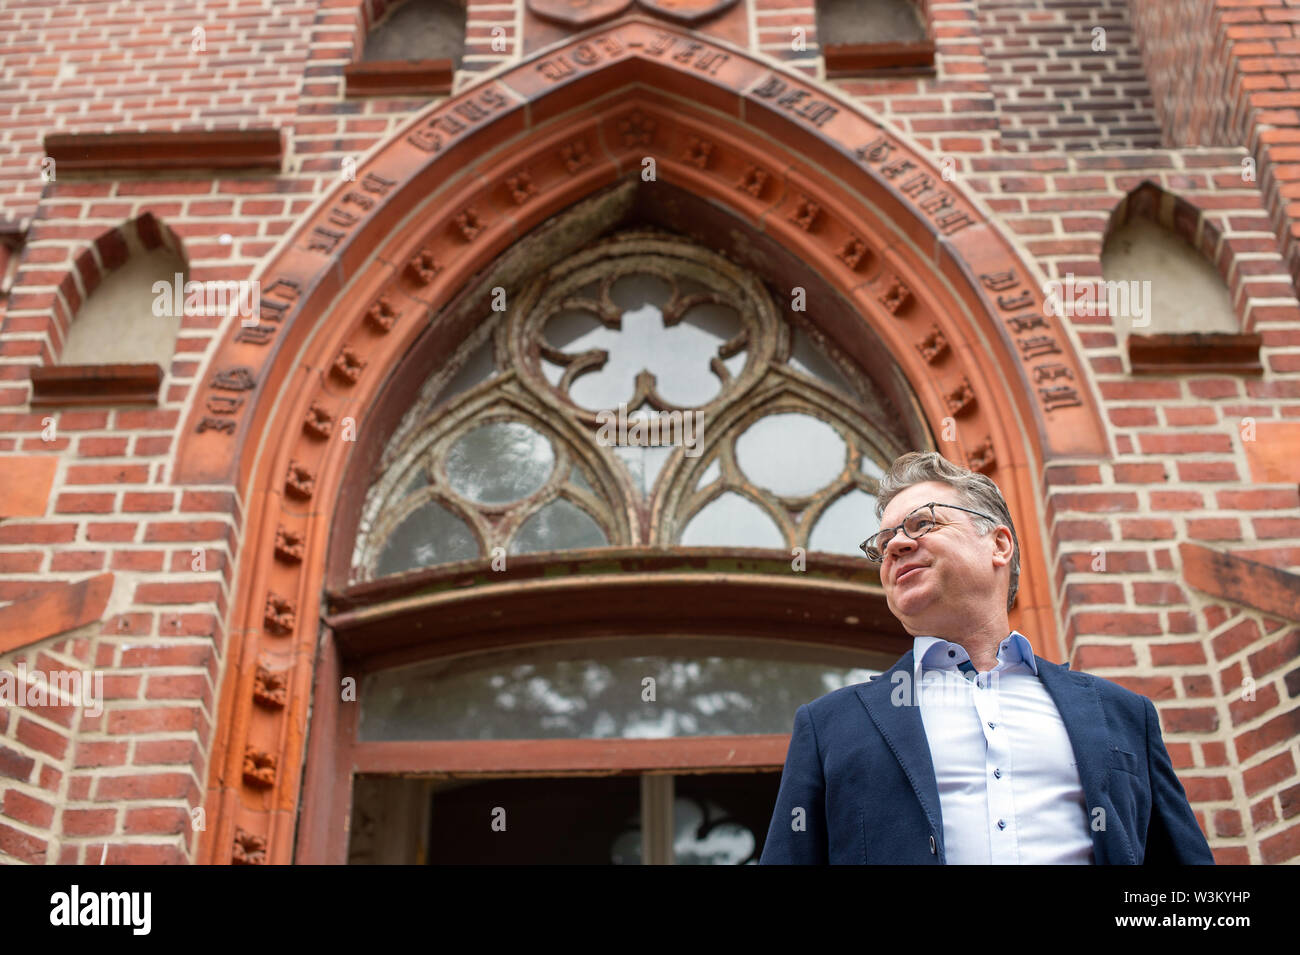 16 July 2019, Saxony-Anhalt, Wittenmoor: Olaf Stehwien ... Saxony House Plans on carinthia house plan, dresden house plan, luxembourg house plan,